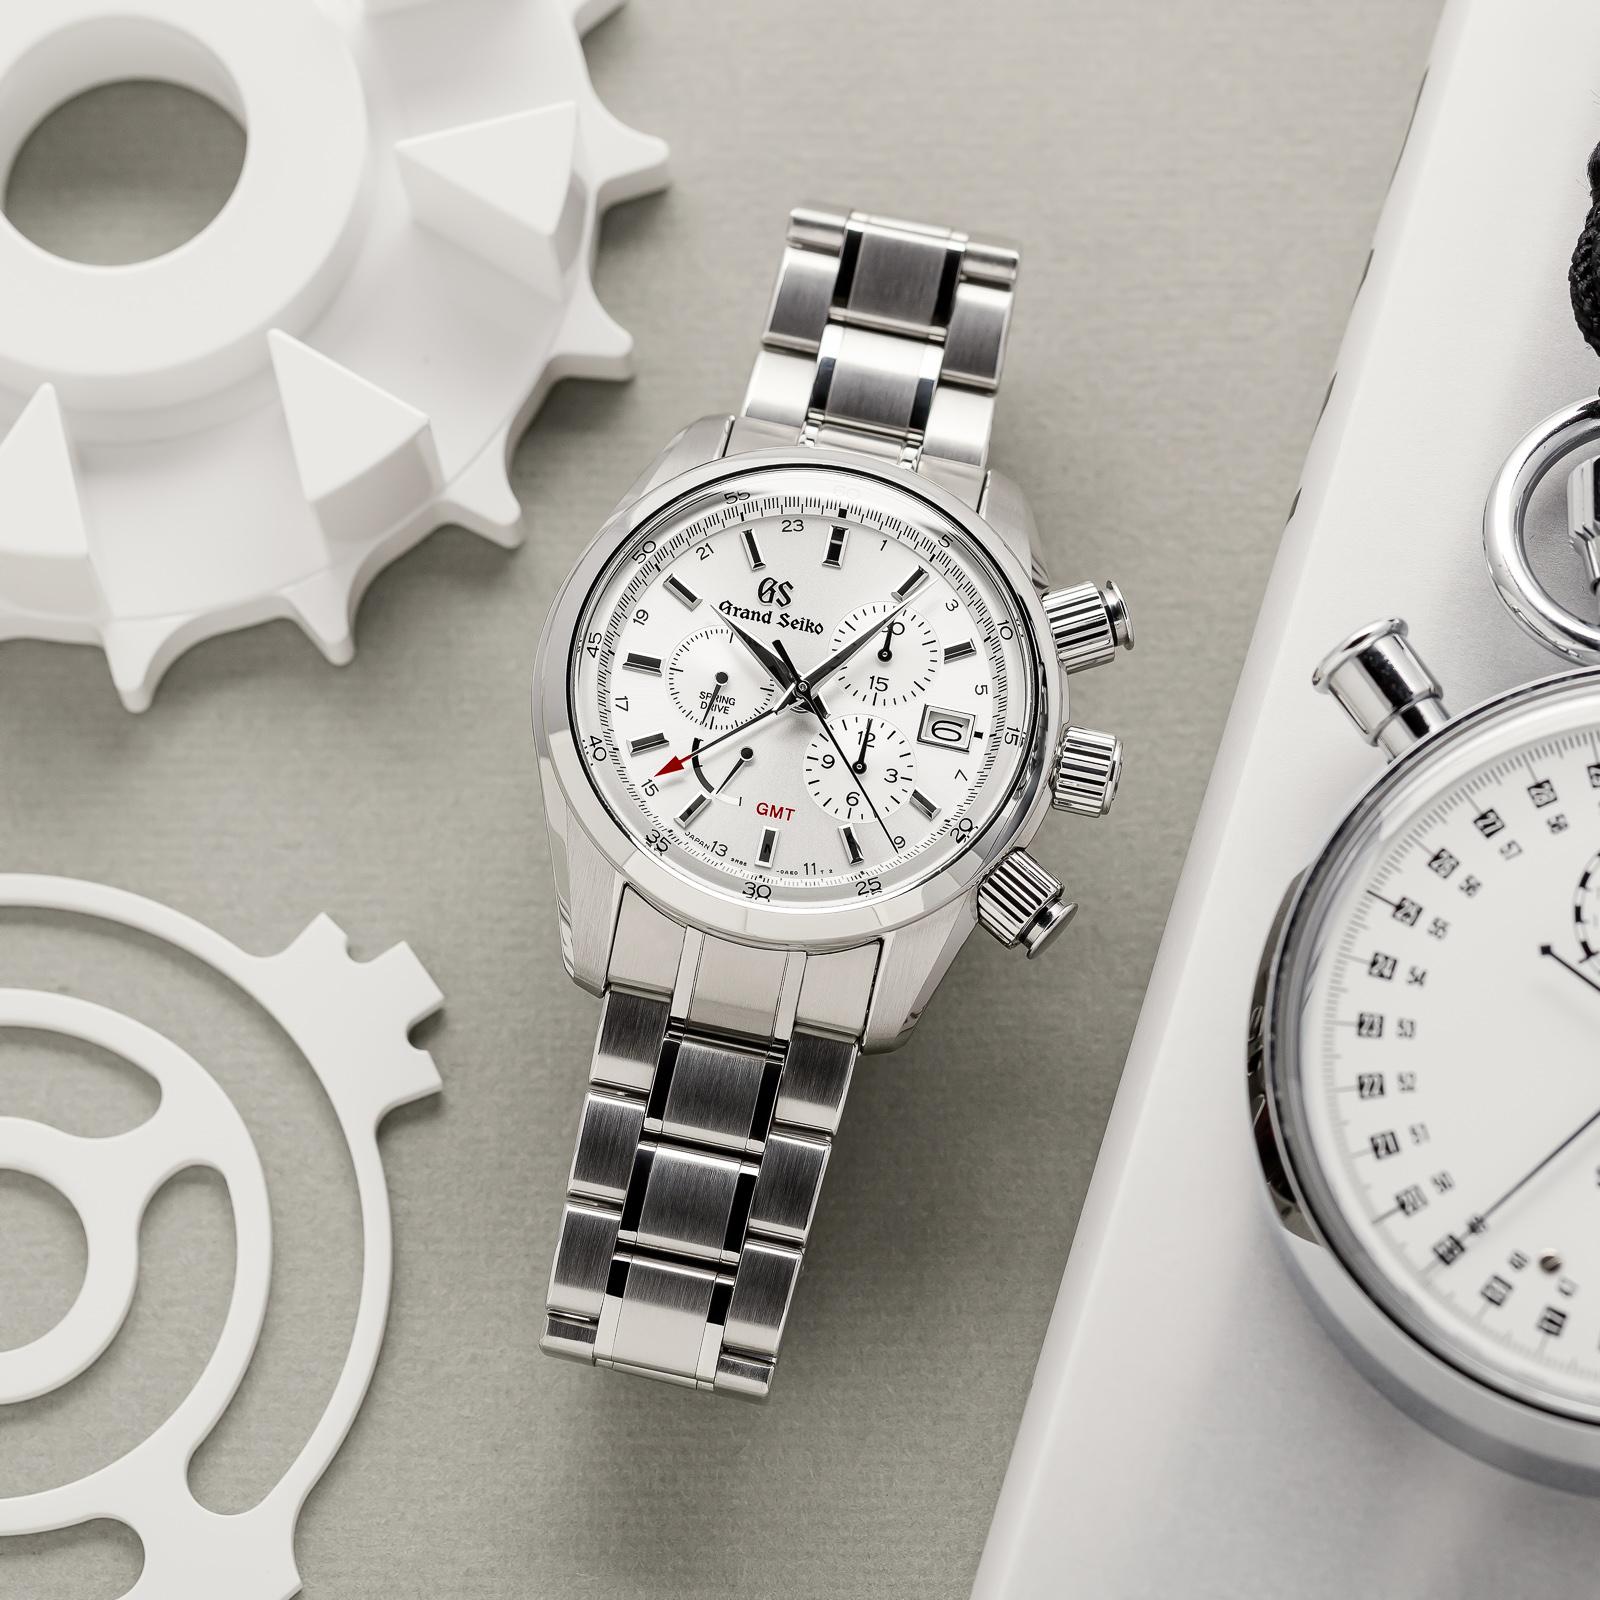 Grand Seiko chronograph SBGC201 - white dial, stainless steel wristwatch atop a gray table.